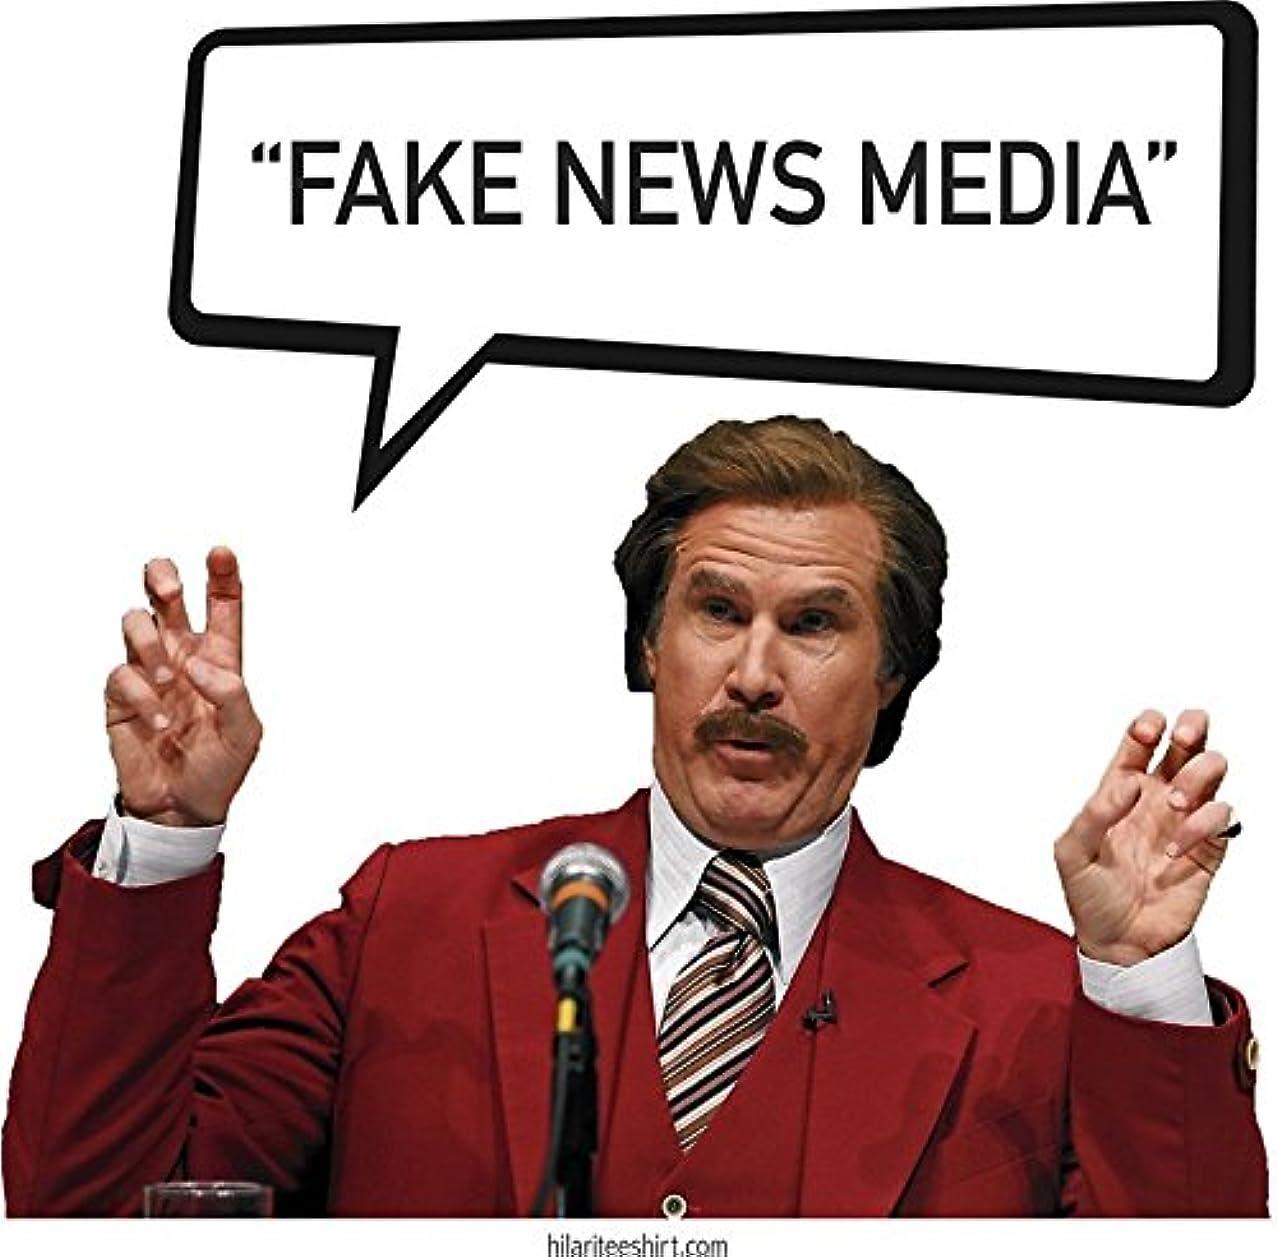 MAGNET Fake News Media - Ron Burgundy, Anchorman, Trump MAGA GOP 2020 Magnet Decal Fridge Metal Magnet Window Vinyl 5